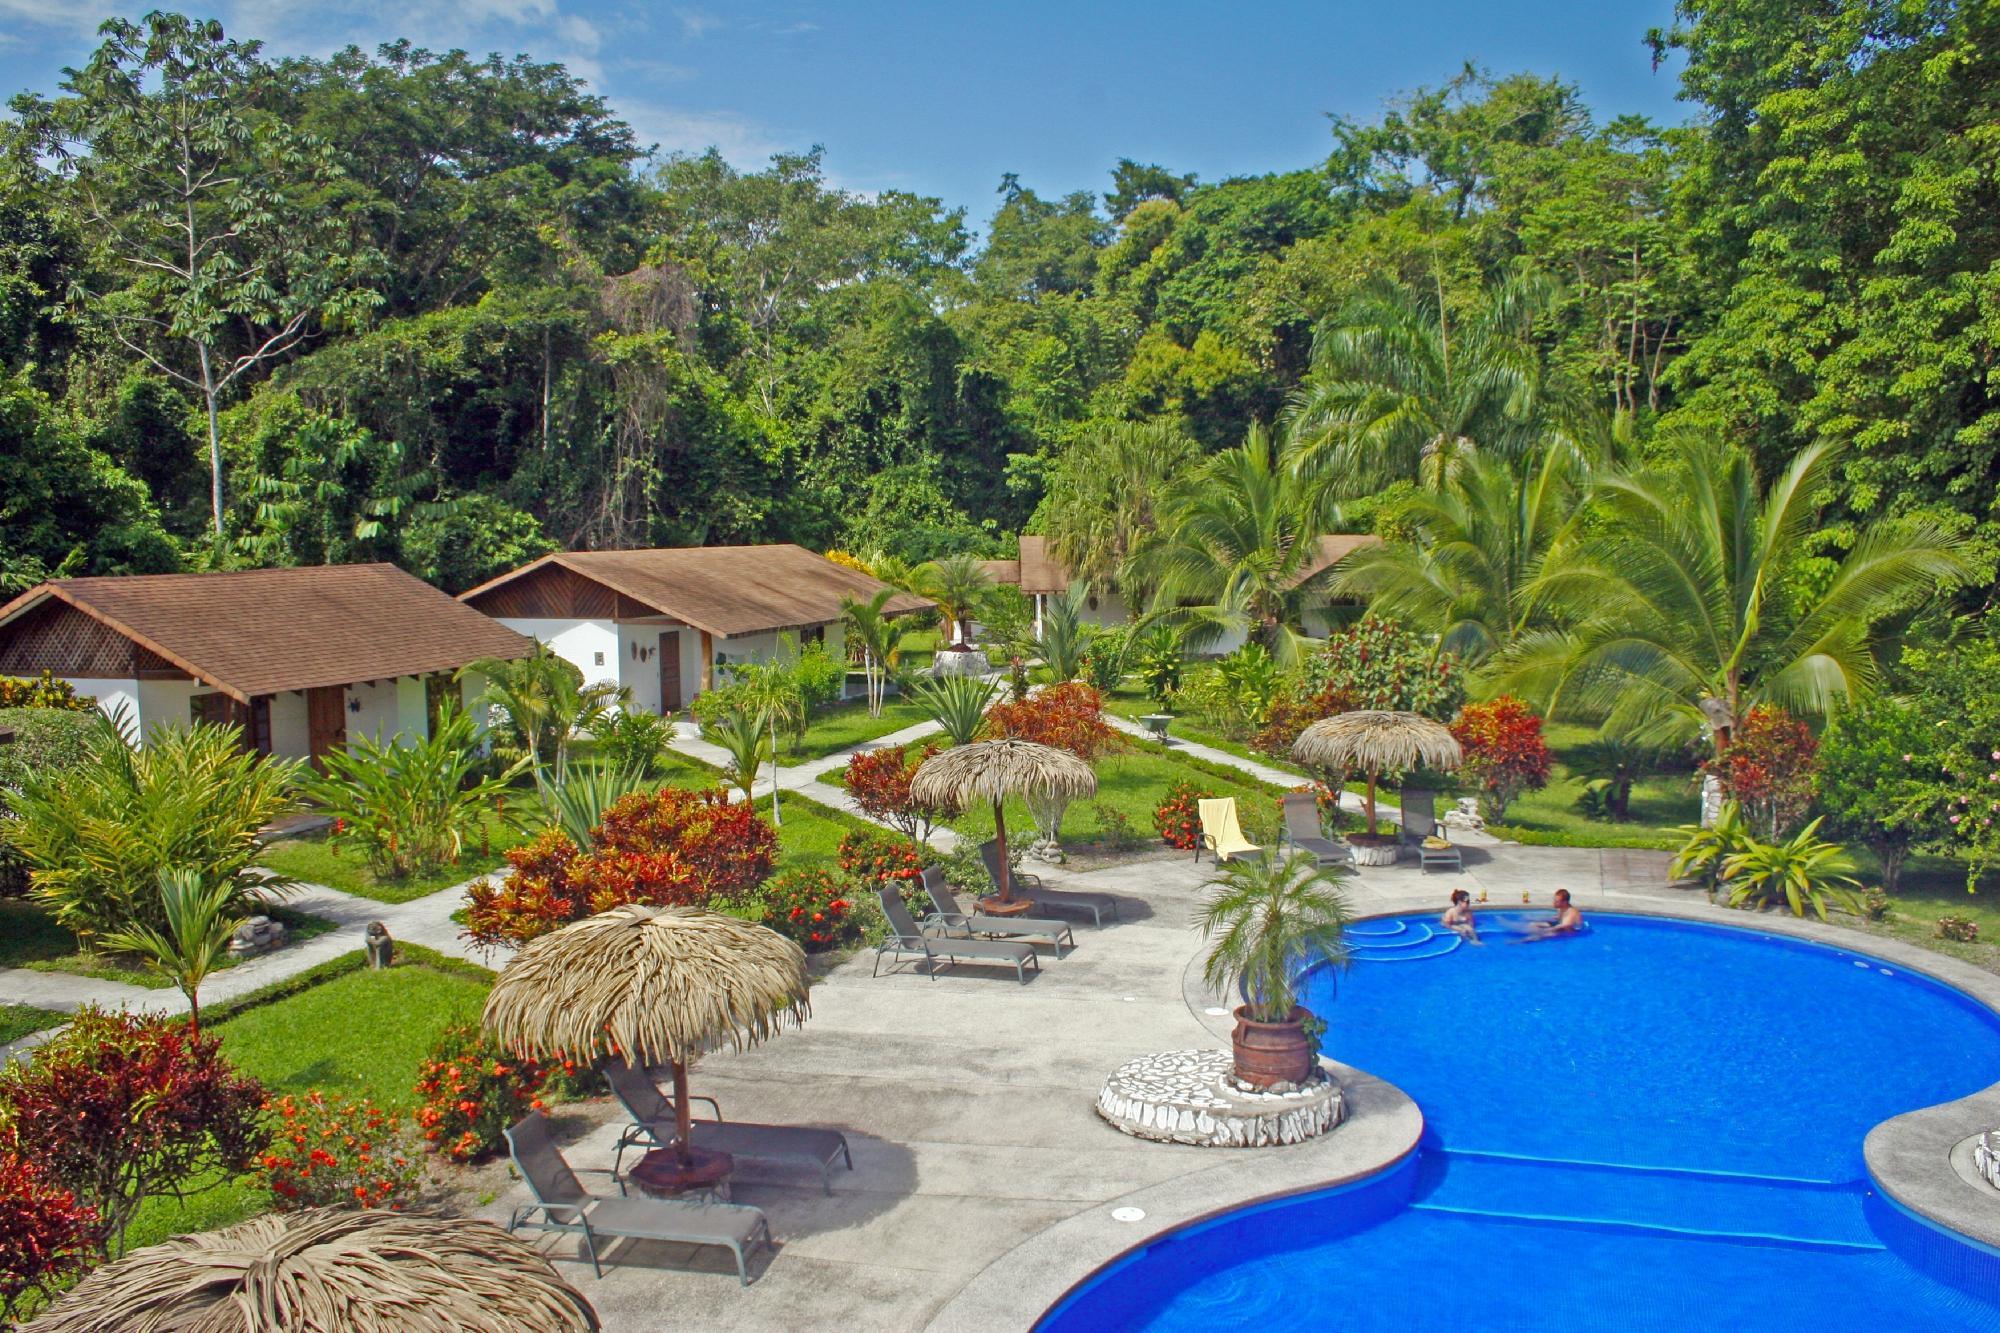 Suizo Loco Lodge Hotel & Resort